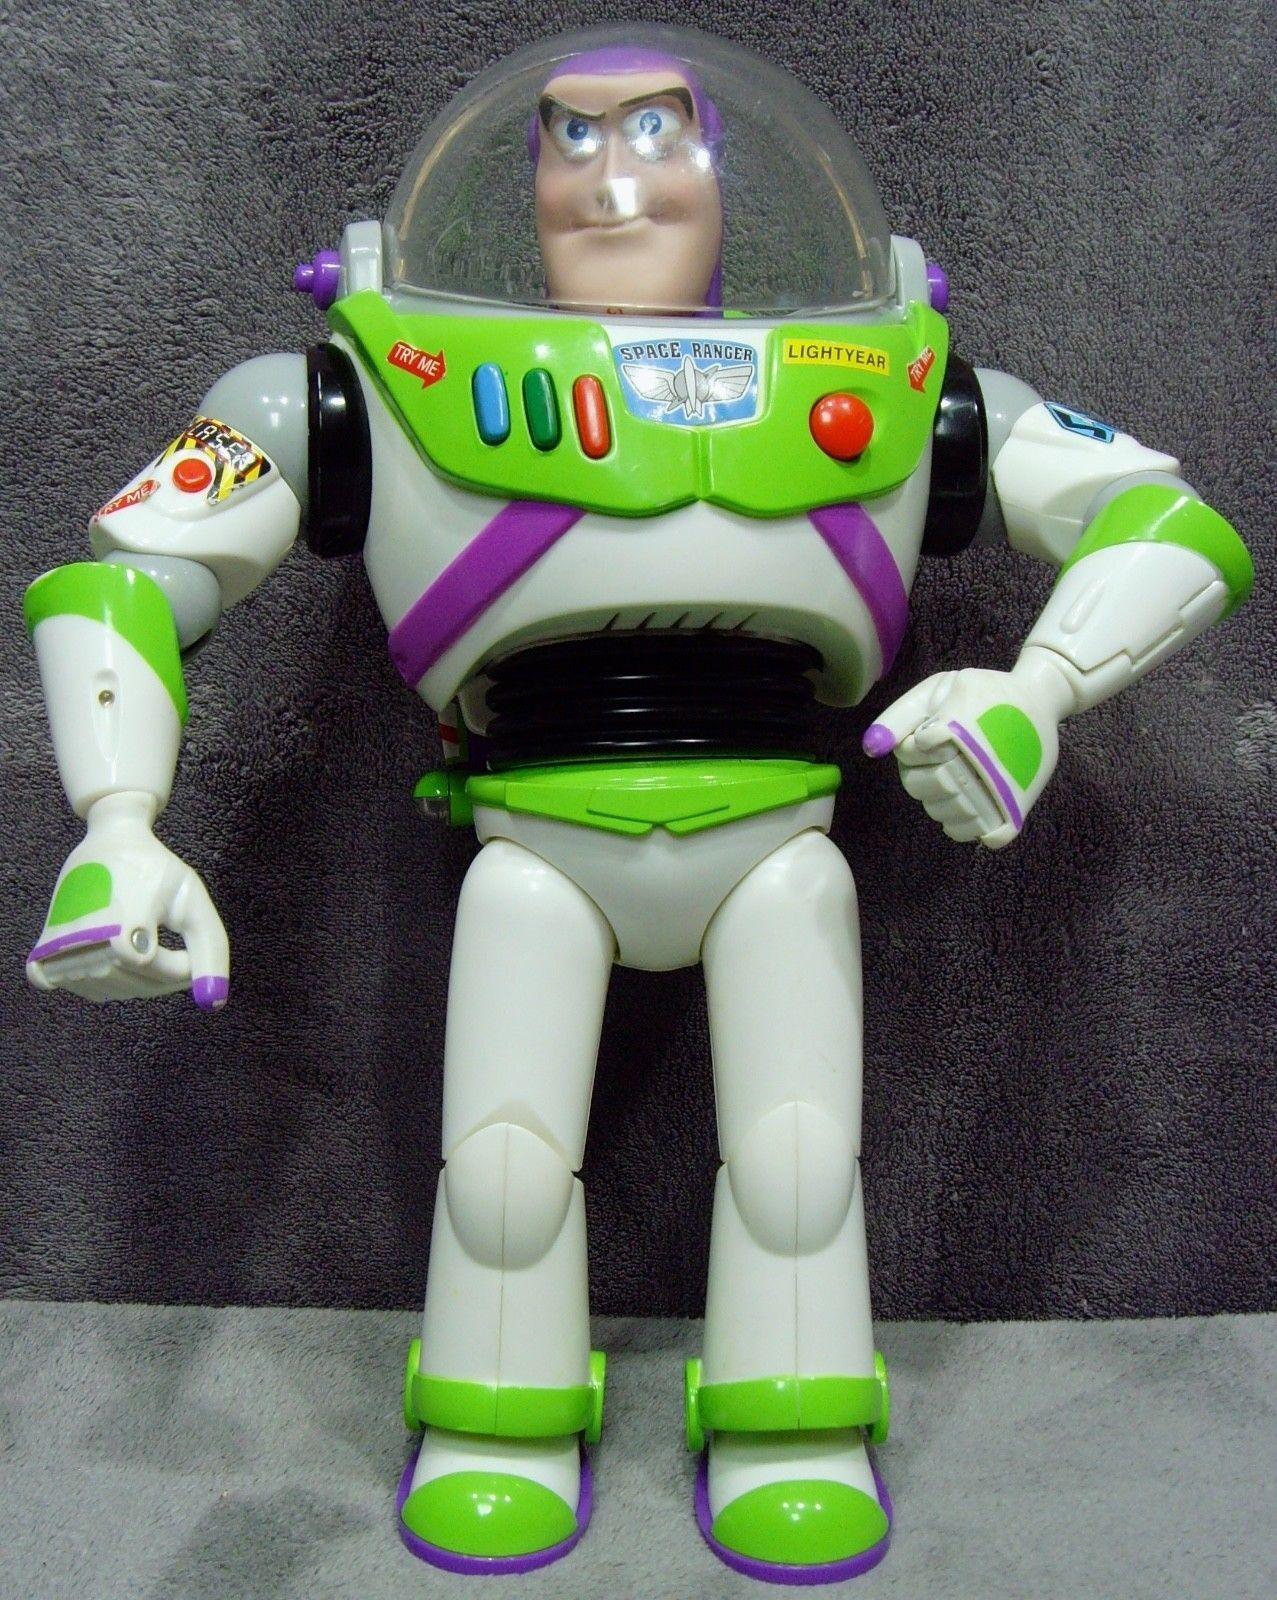 Disney/Pixar•Accessories Advanced•Talking Buzz Lightyear•12 inch Action Figure